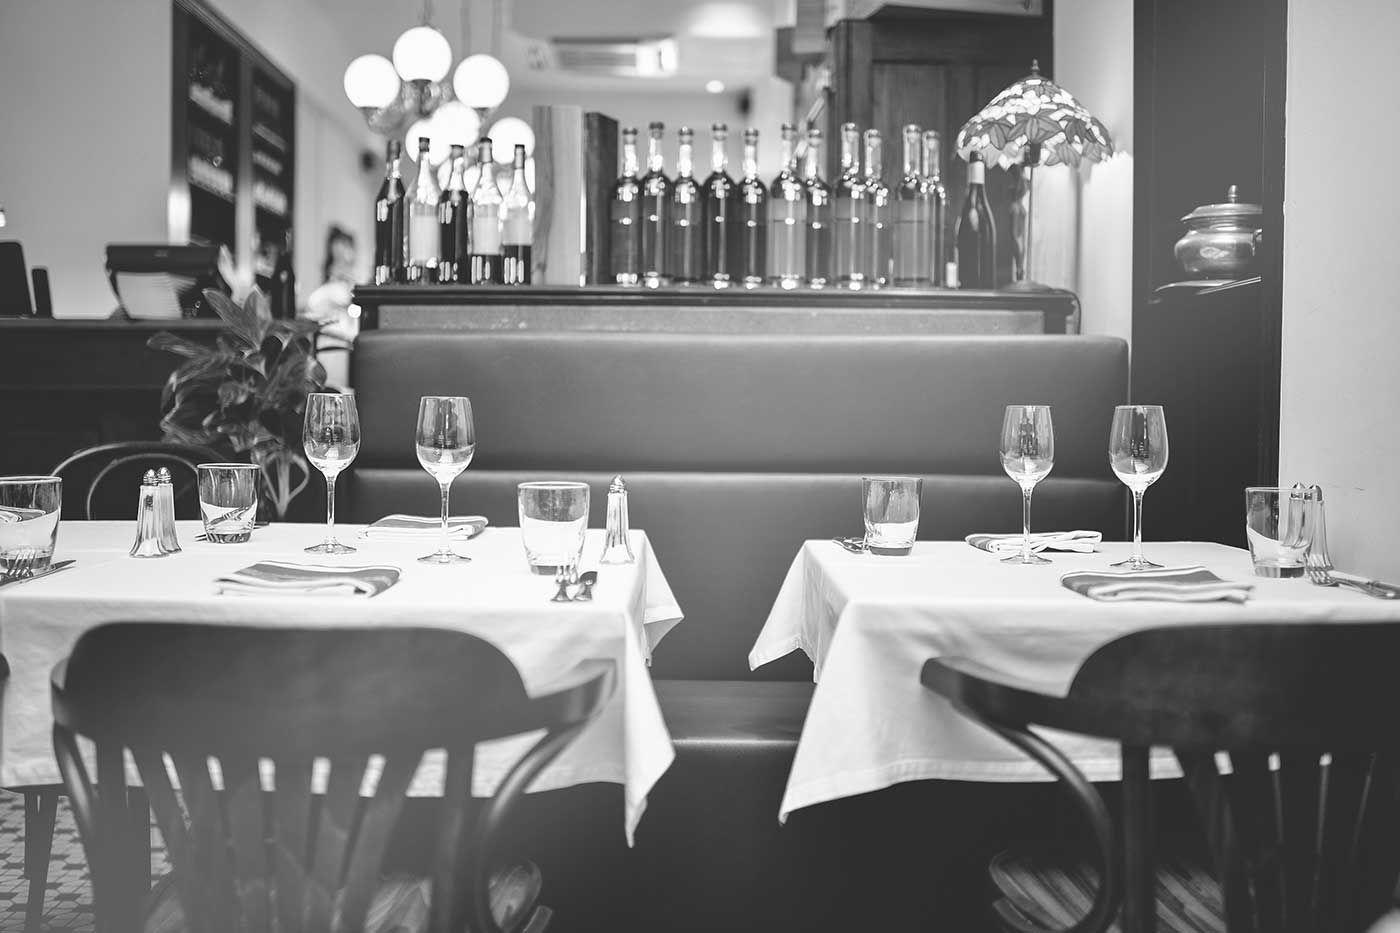 Brasserie Gavroche Dining Vouchers